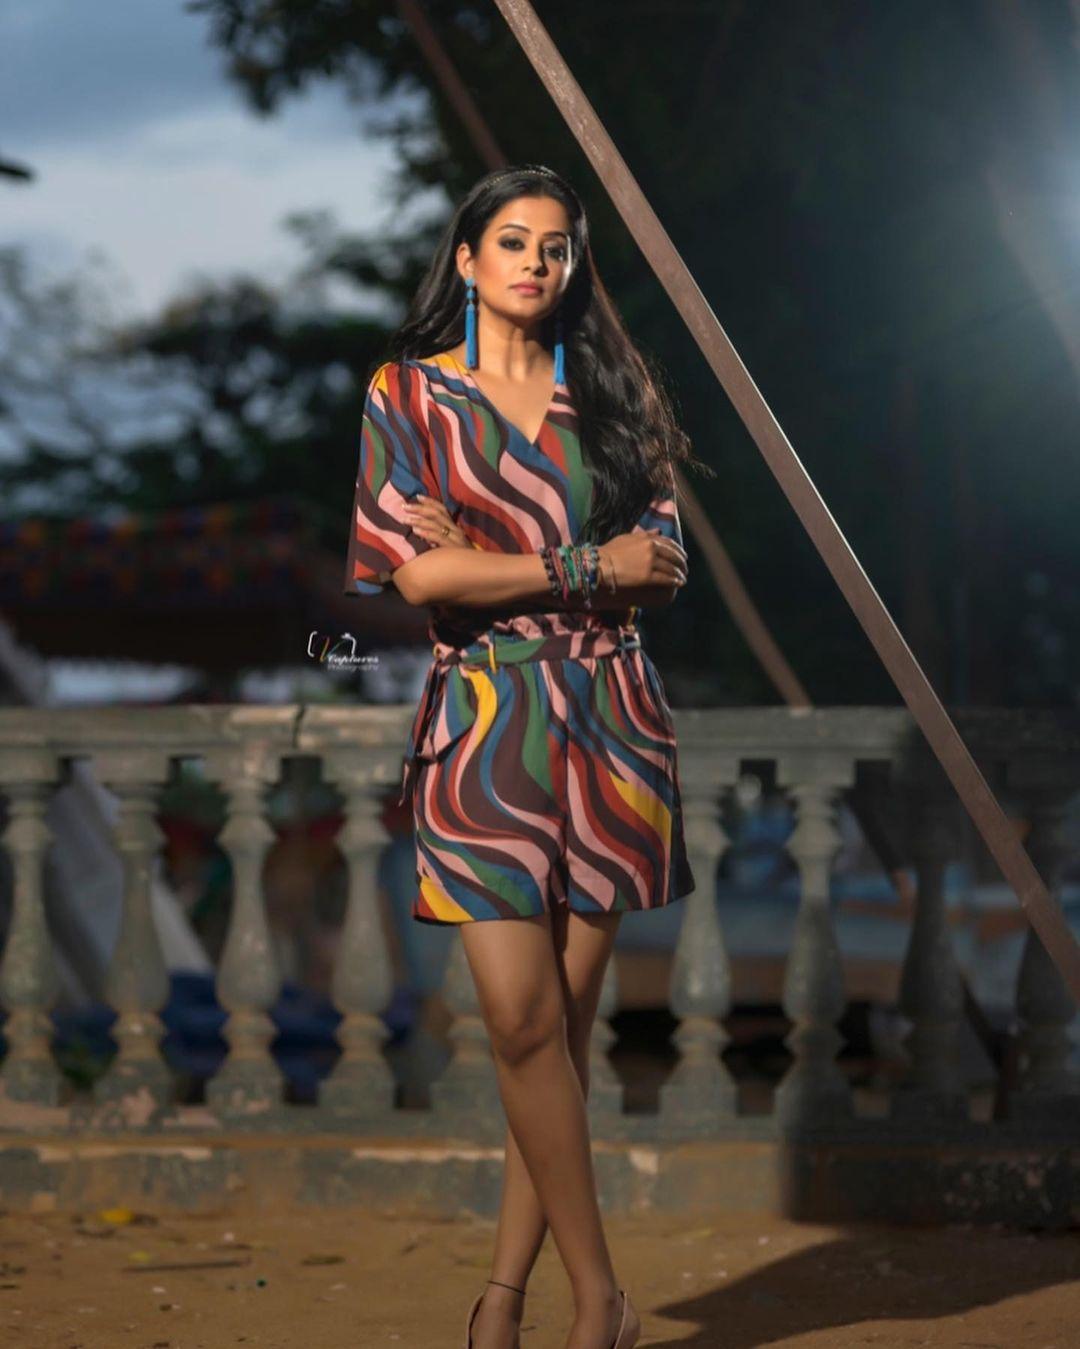 Gorgeous actress Priyamani in leheriya jump suit for Dhee program. Outfit: Ttwenty dresses. Styling: Mehek Shetty. 2021-09-15